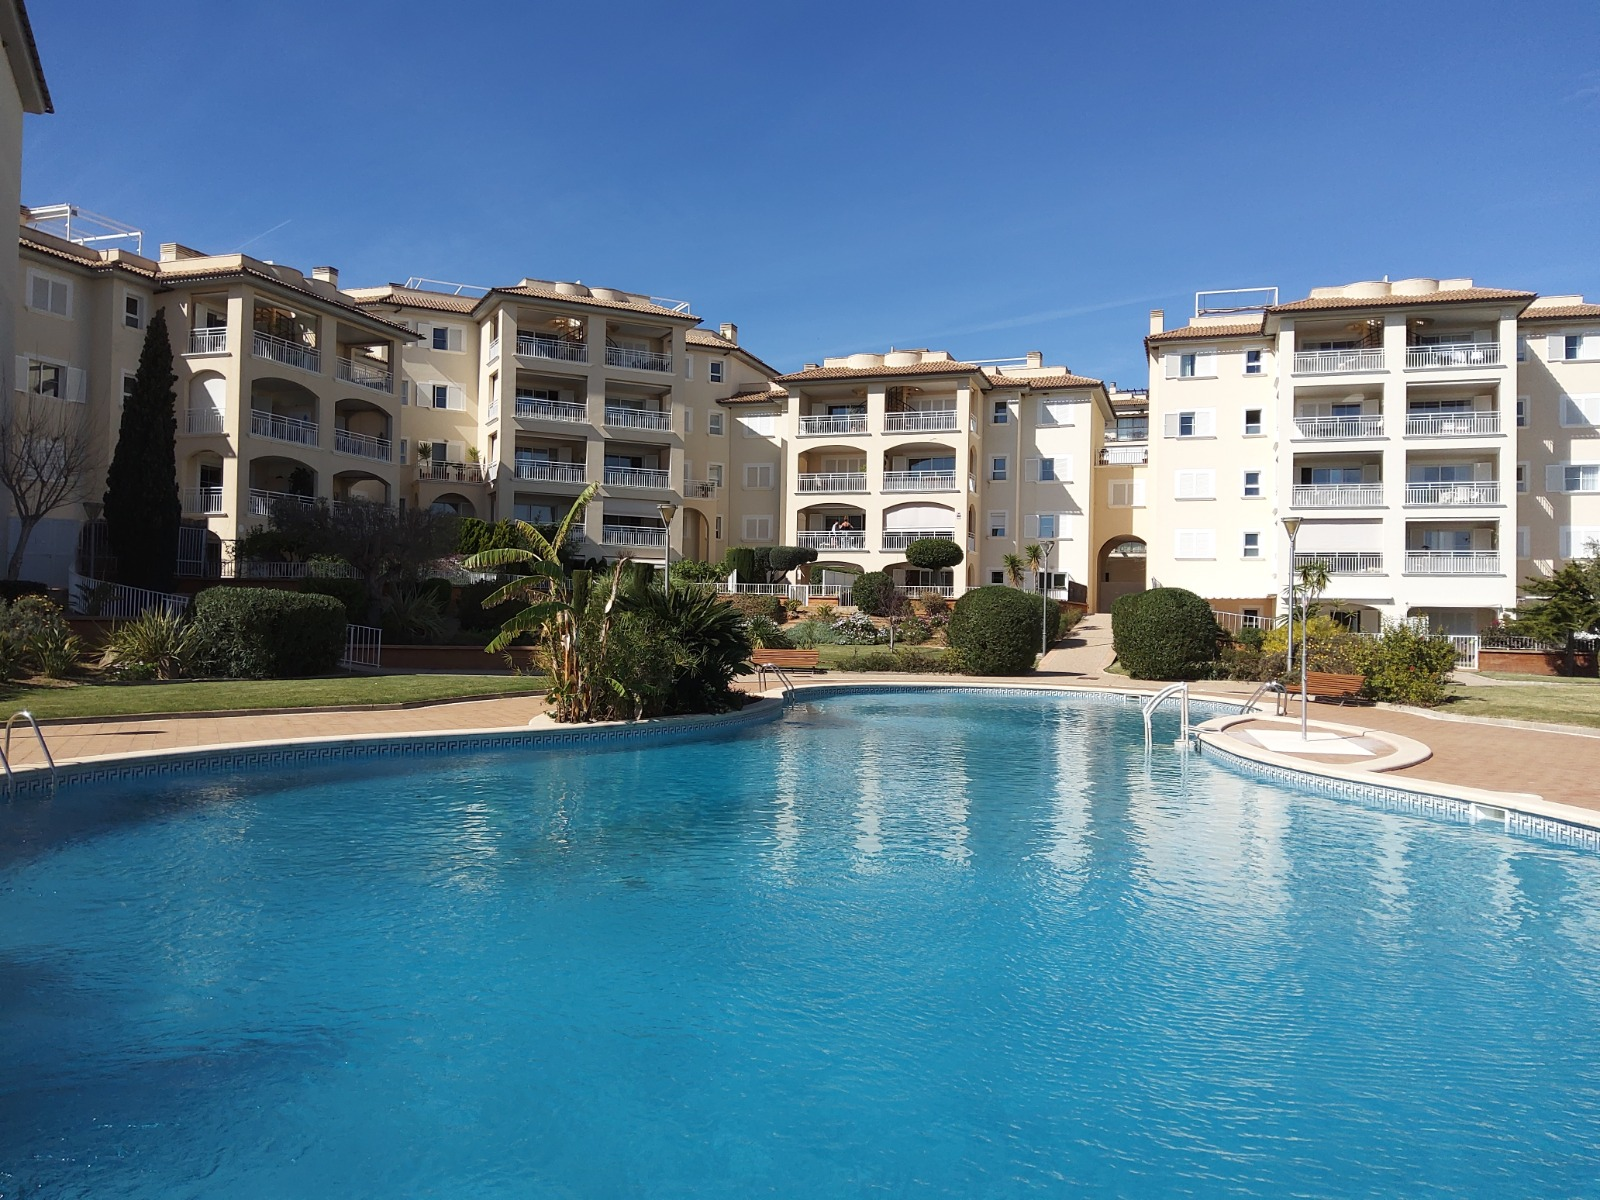 Exclusive apartment close to Son Vida golf course, pool, tennis cort